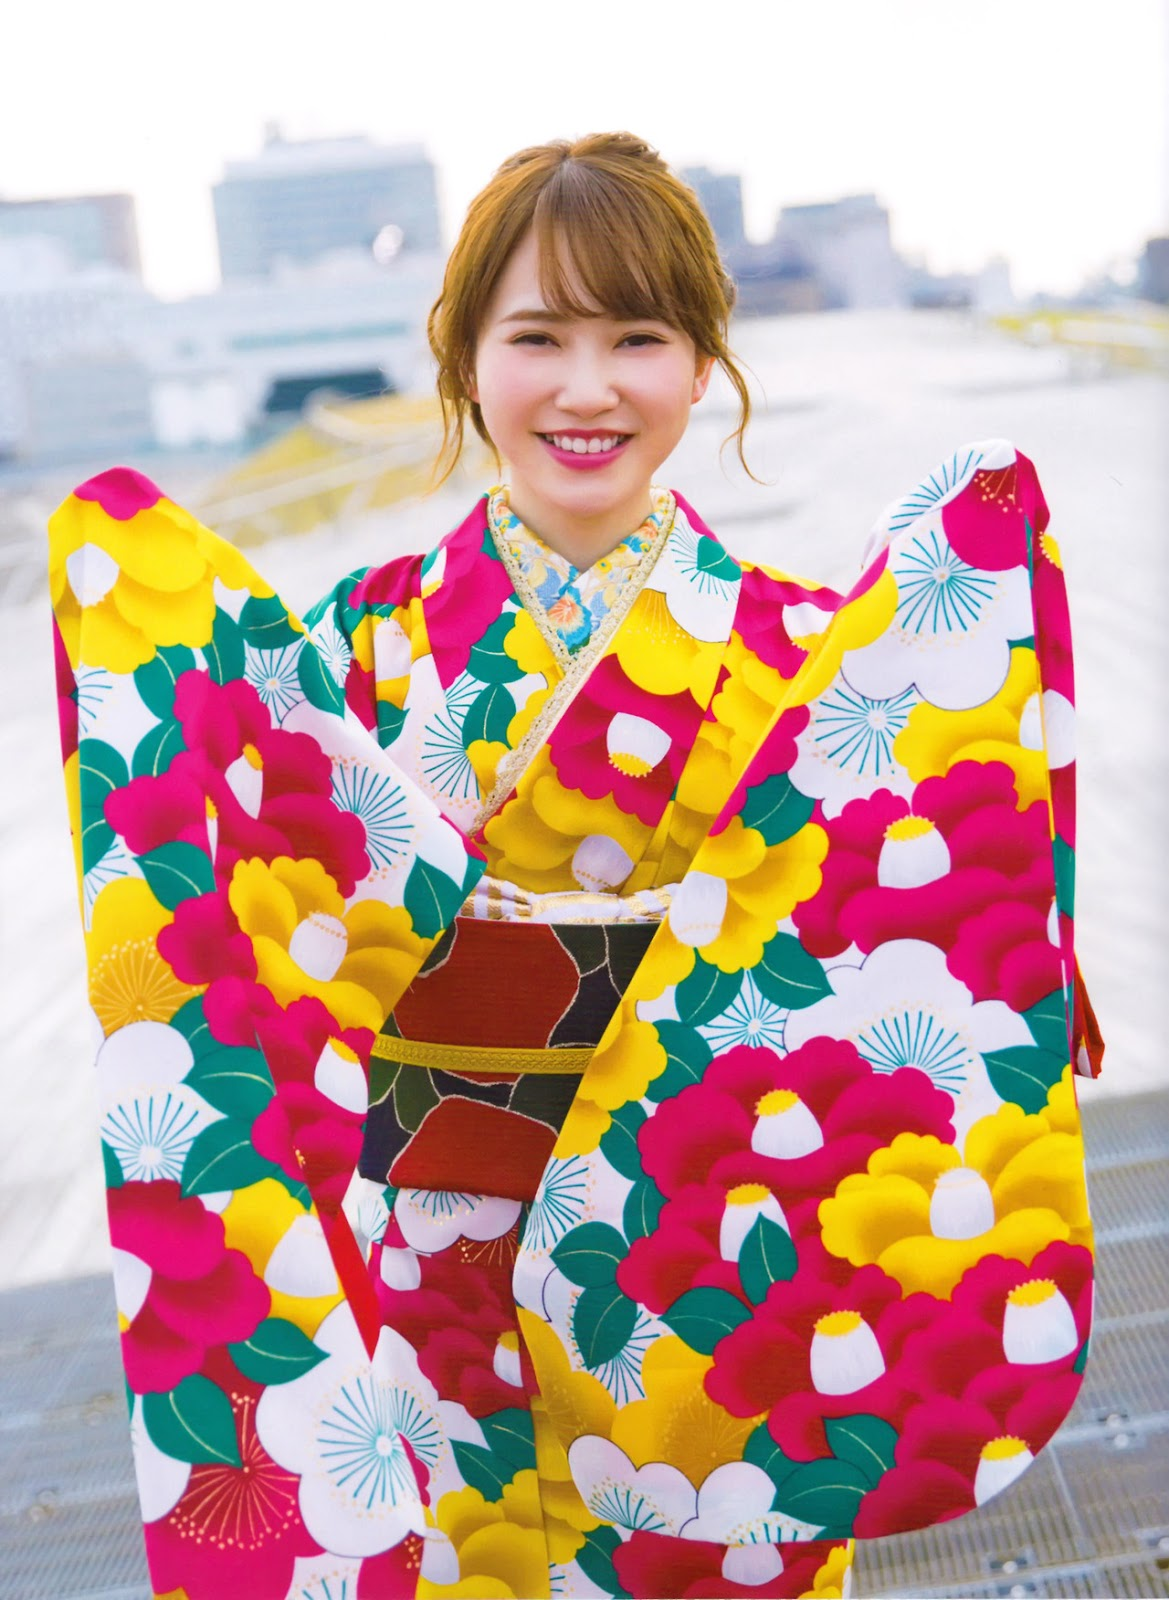 Kato Shiho 加藤史帆, TOKYO NEWS MOOK 2018.01.04 No.02 (20±Sweet KEYAKIZAKA)